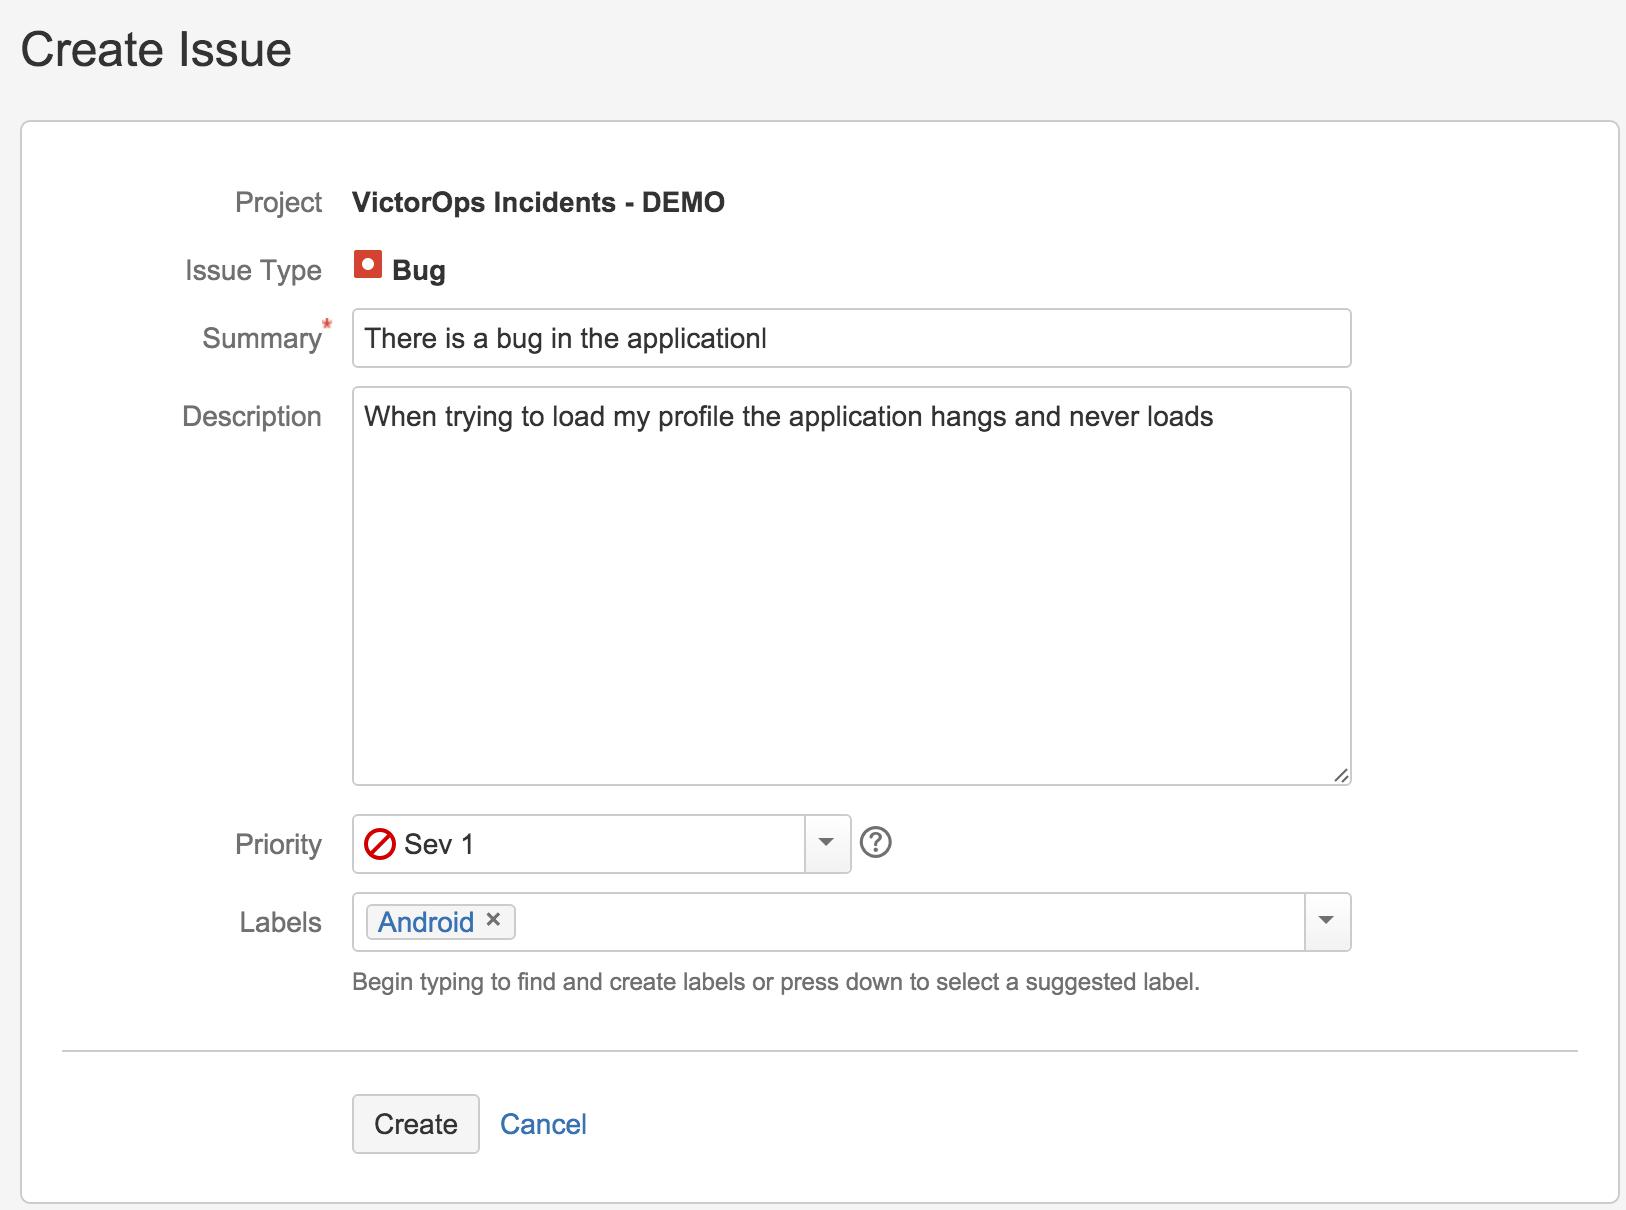 Create an Issue in Jira with custom url - VictorOps